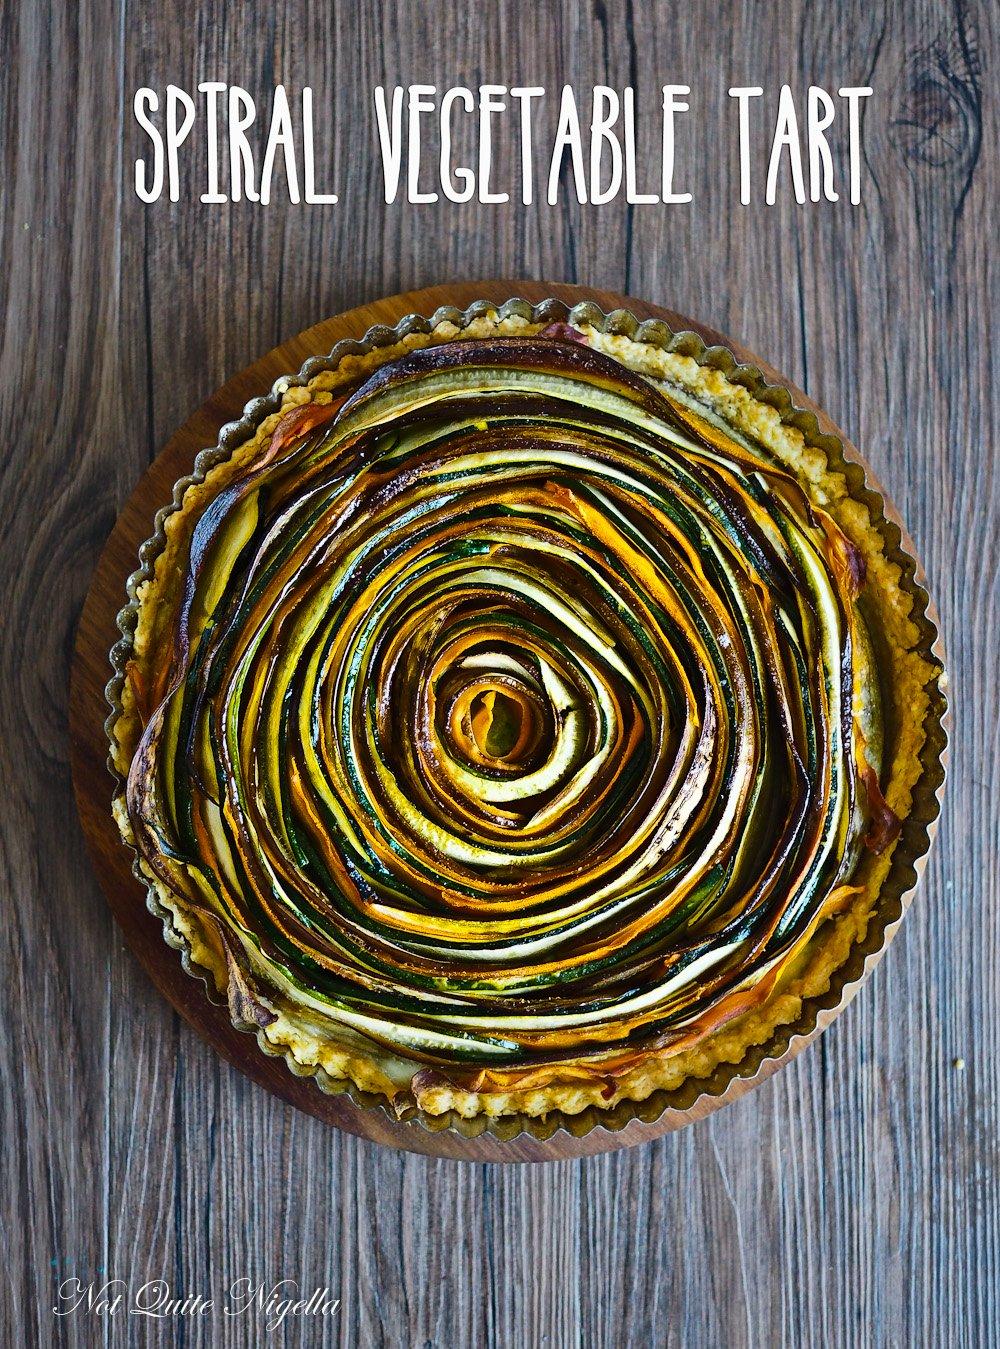 SpiralVegetable Tart